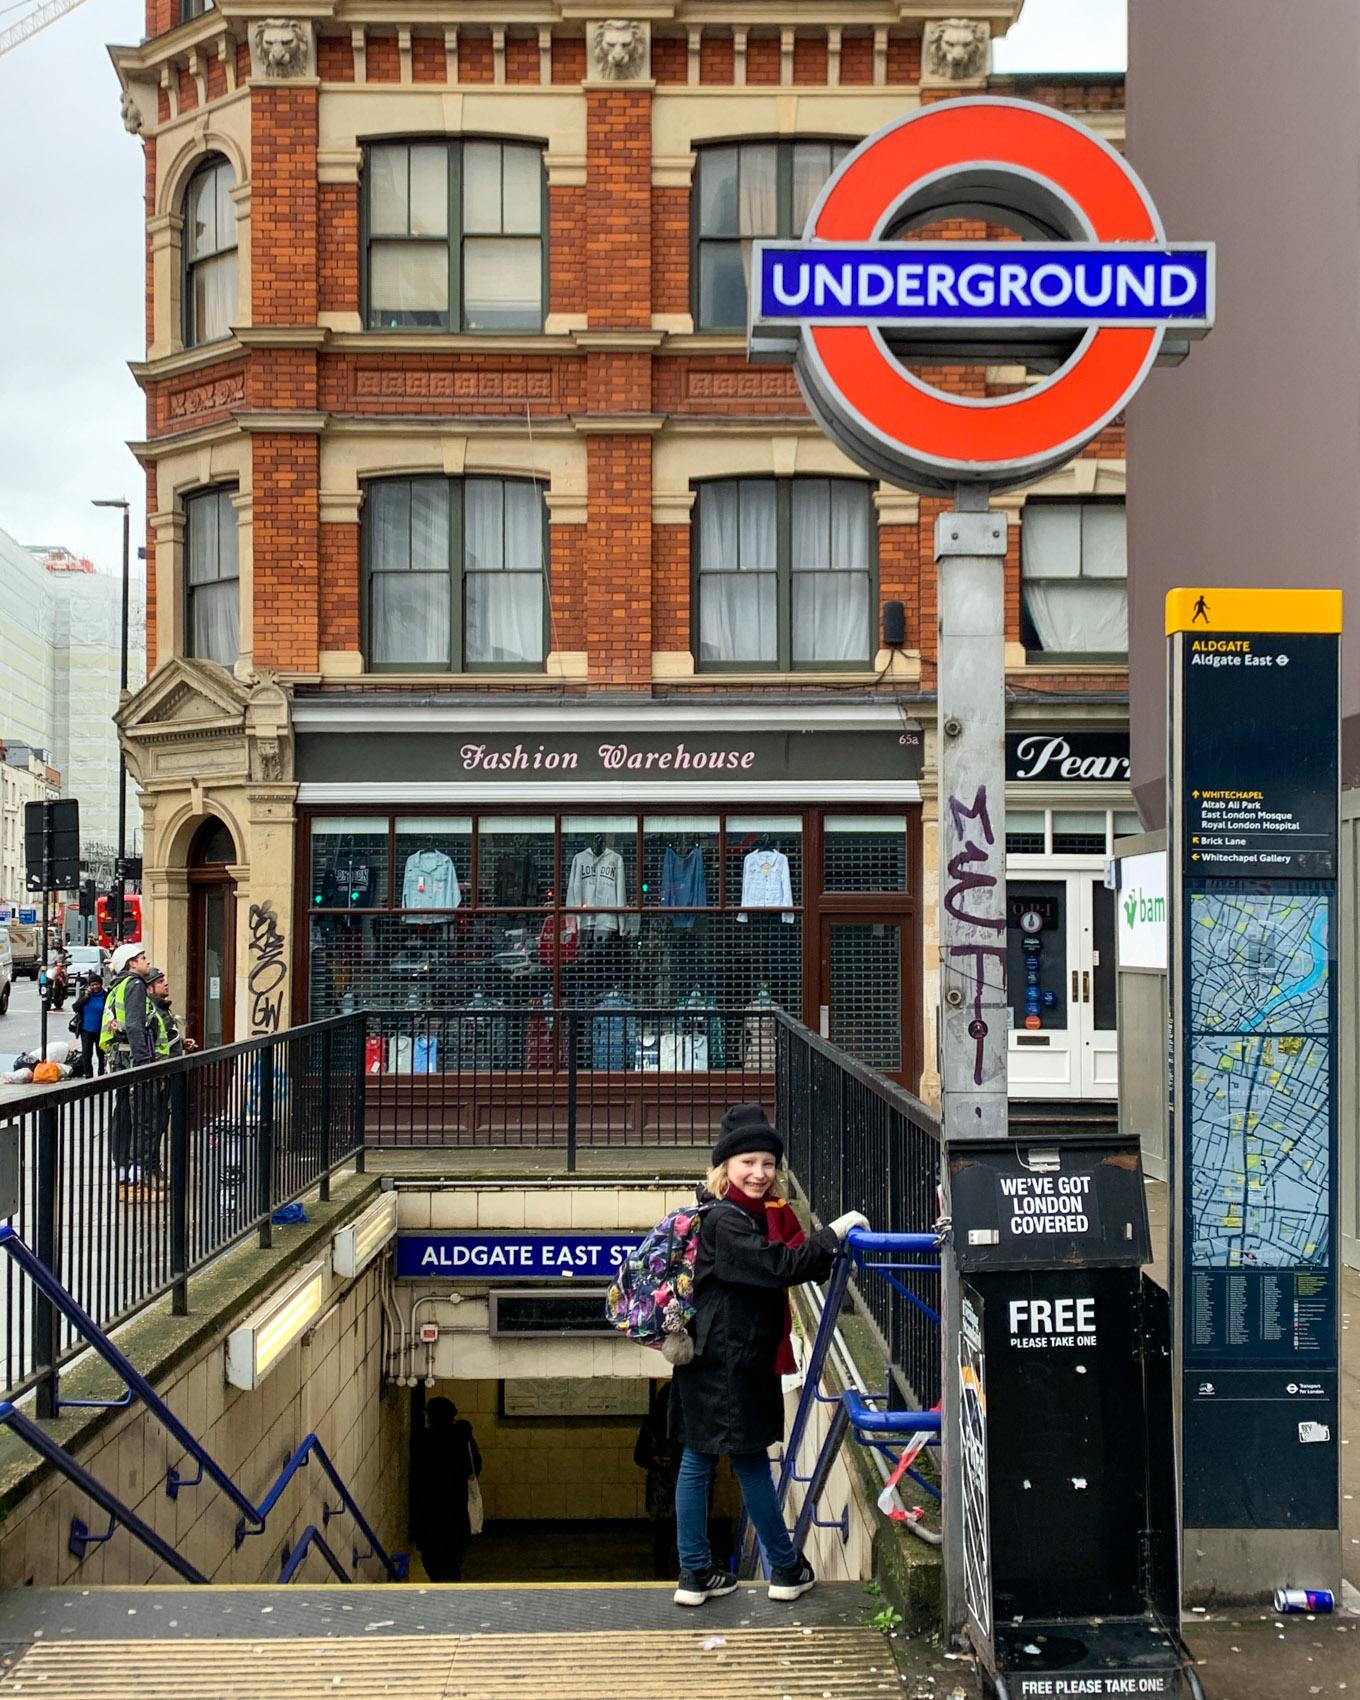 Lontoo - London - Aldgate East